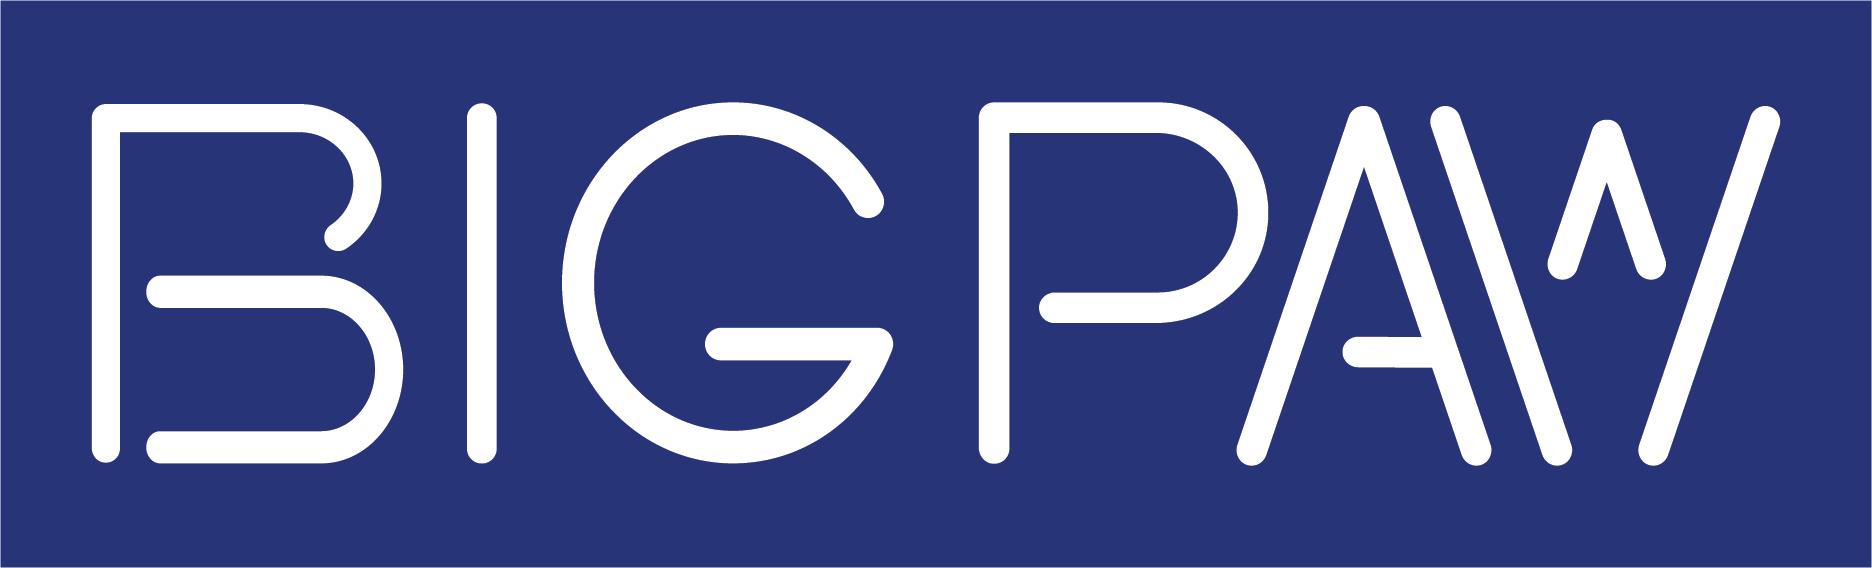 bigpaw-logo-f-straight-blue.jpg